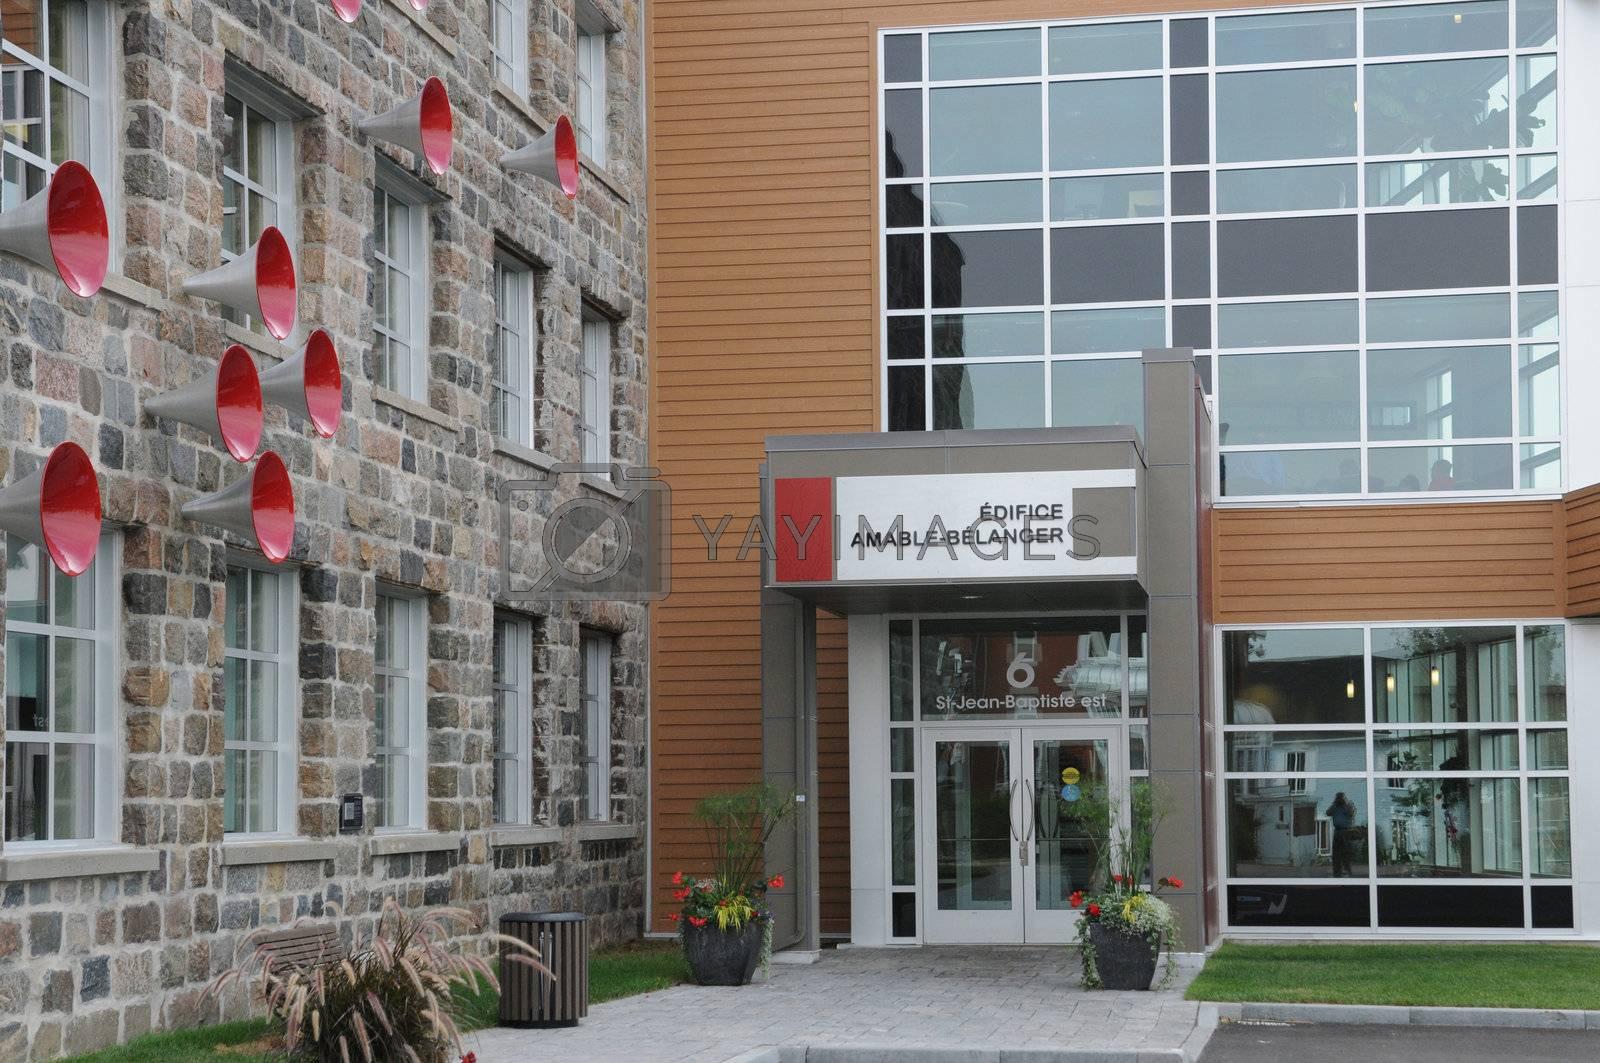 Canada; Quebec, Amable Belanger building in Montmagny